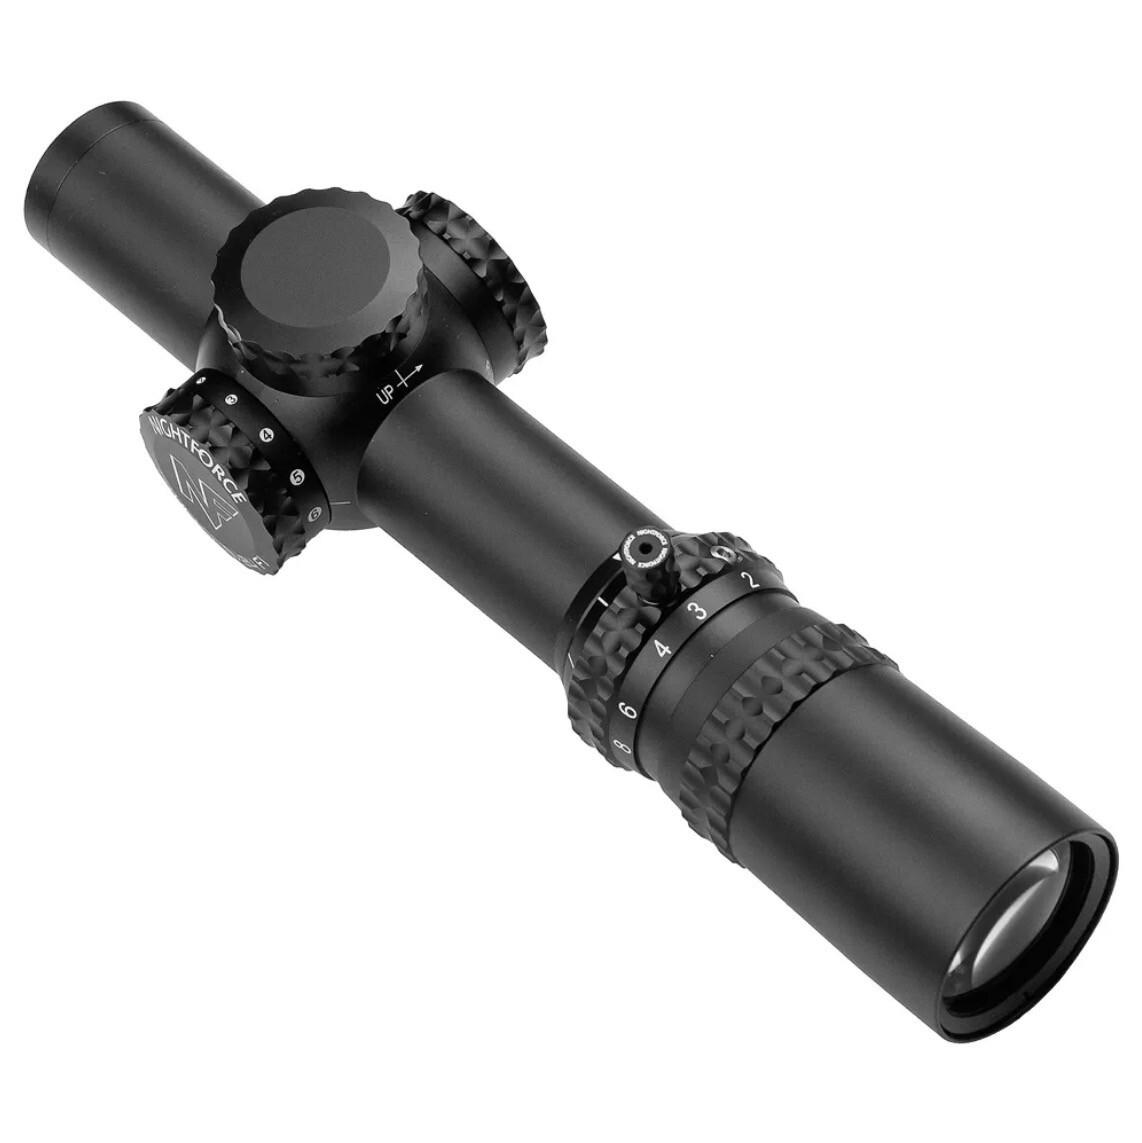 Nightforce ATACR 1-8x24 F1 .1 Mil-Radian NVD PTL FC-DMX C653